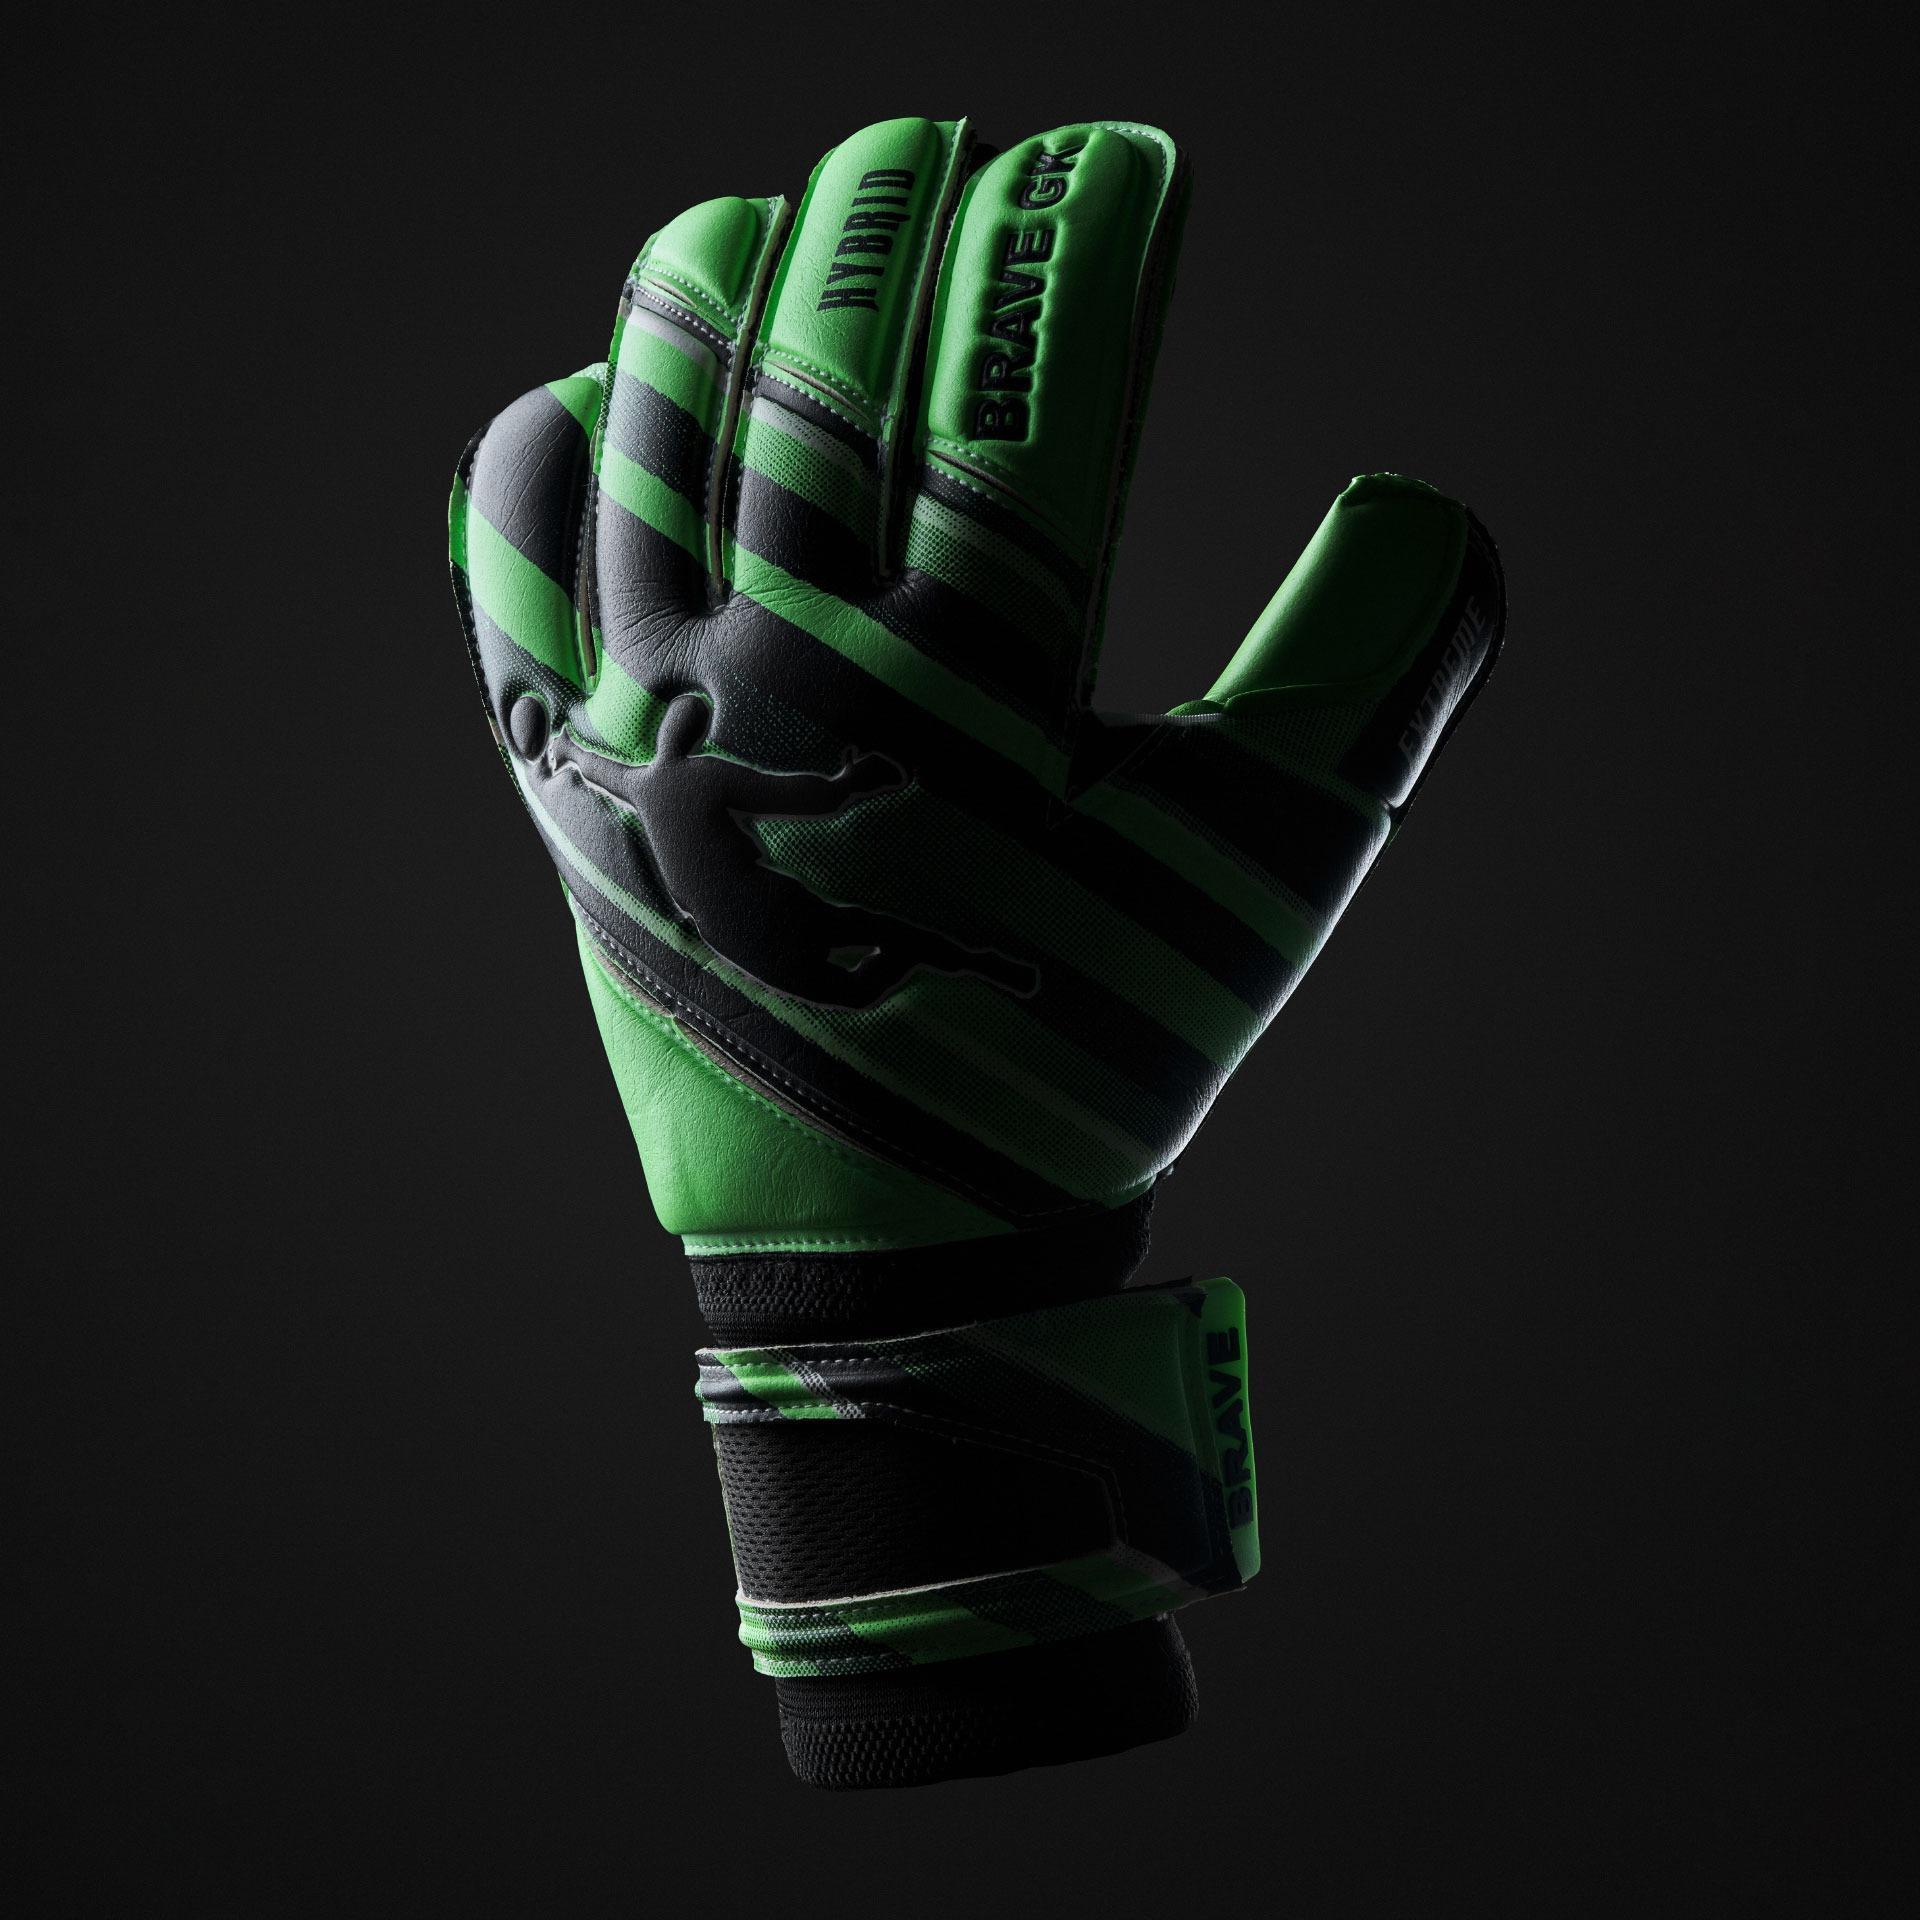 Воротарські рукавиці Brave GK Extreme-офіційний інтернет-магазин Brave GK